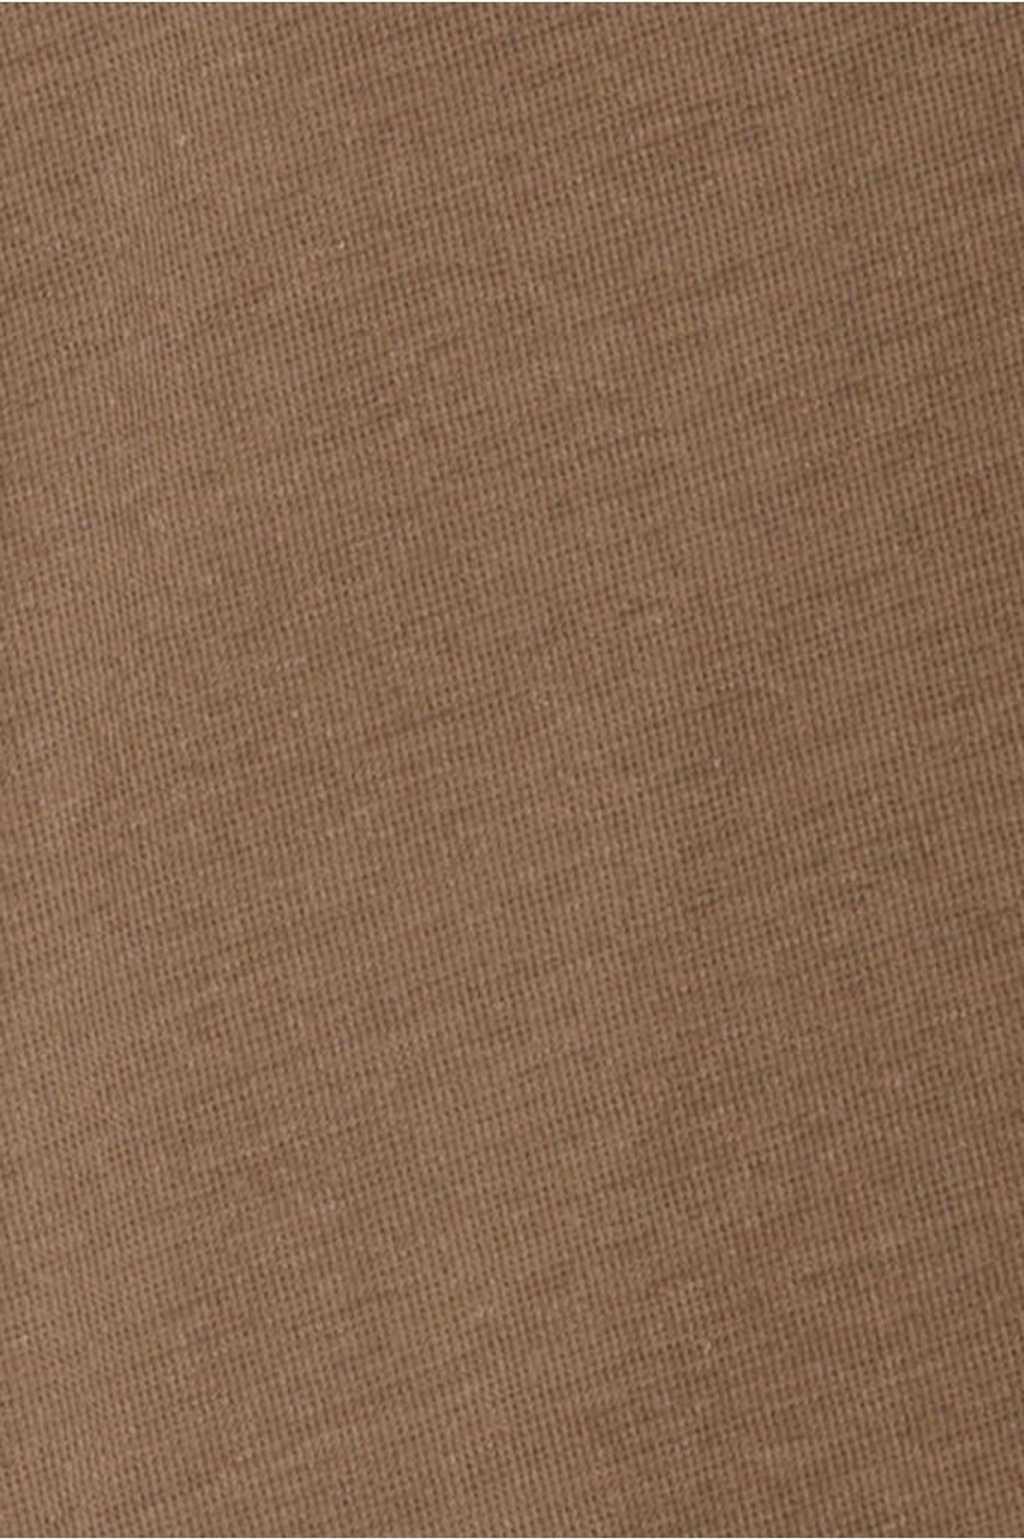 TShirt H241 Brown 6